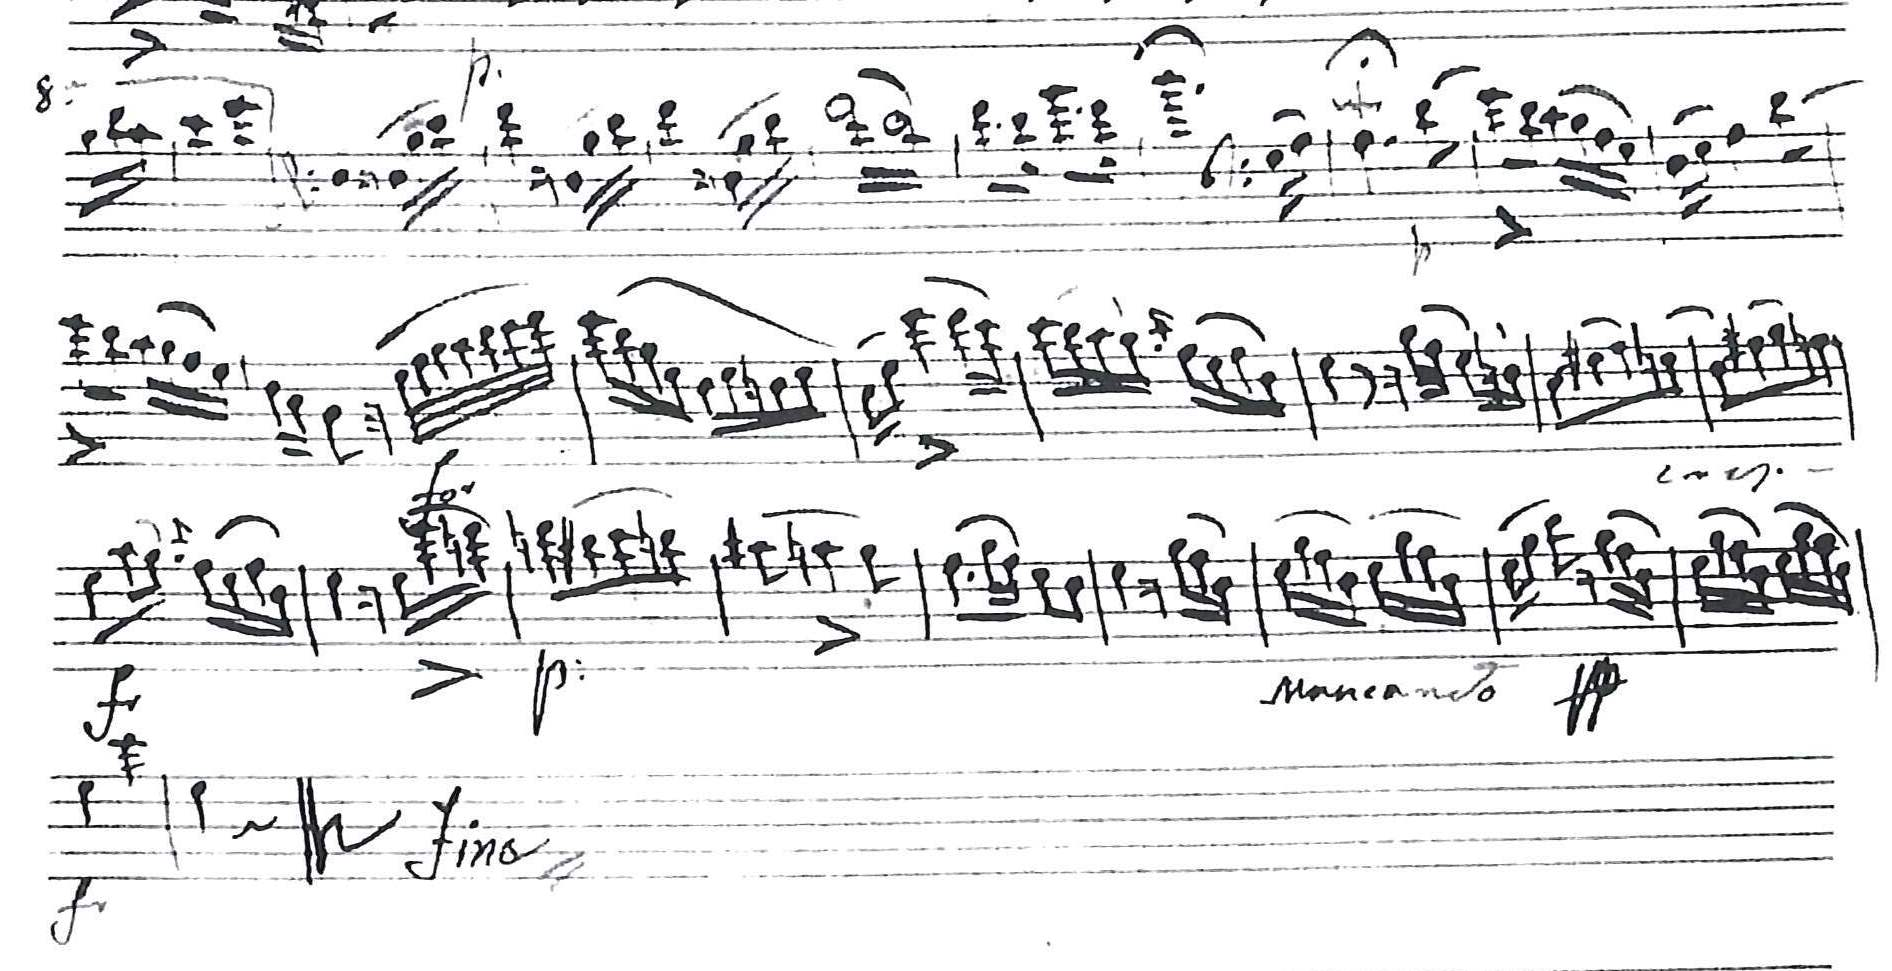 Auschnitt der autographen Kontrabass-Stimme (Quelle: GB-Lbl: Add. Ms. 17832-4)